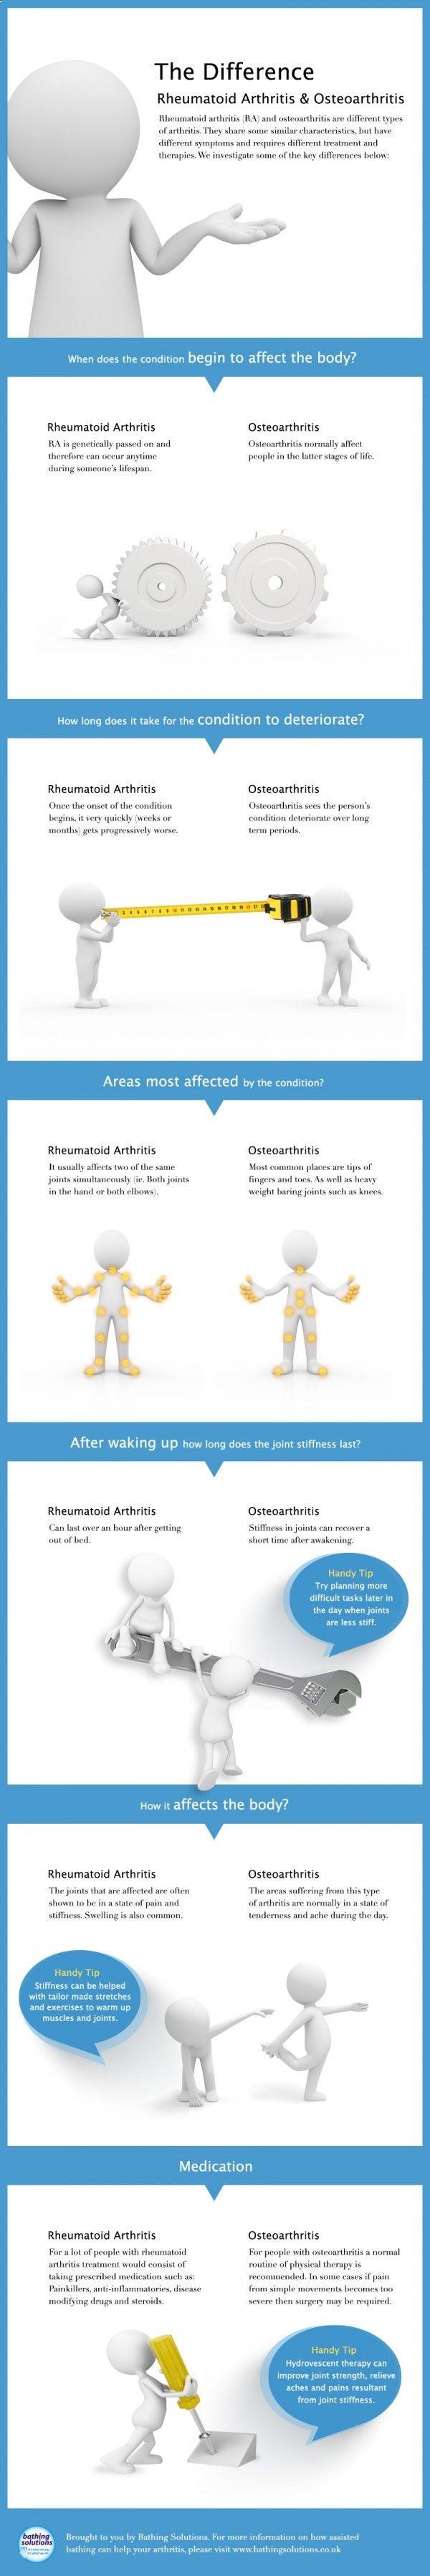 Arthritis Remedies Hands Natural Cures - Arthritis Remedies Hands Natural Cures - The Differences between Osteoarthritis and Rheumatoid Arthritis Arthritis Remedies Hands Natural Cures - Arthritis Remedies Hands Natural Cures